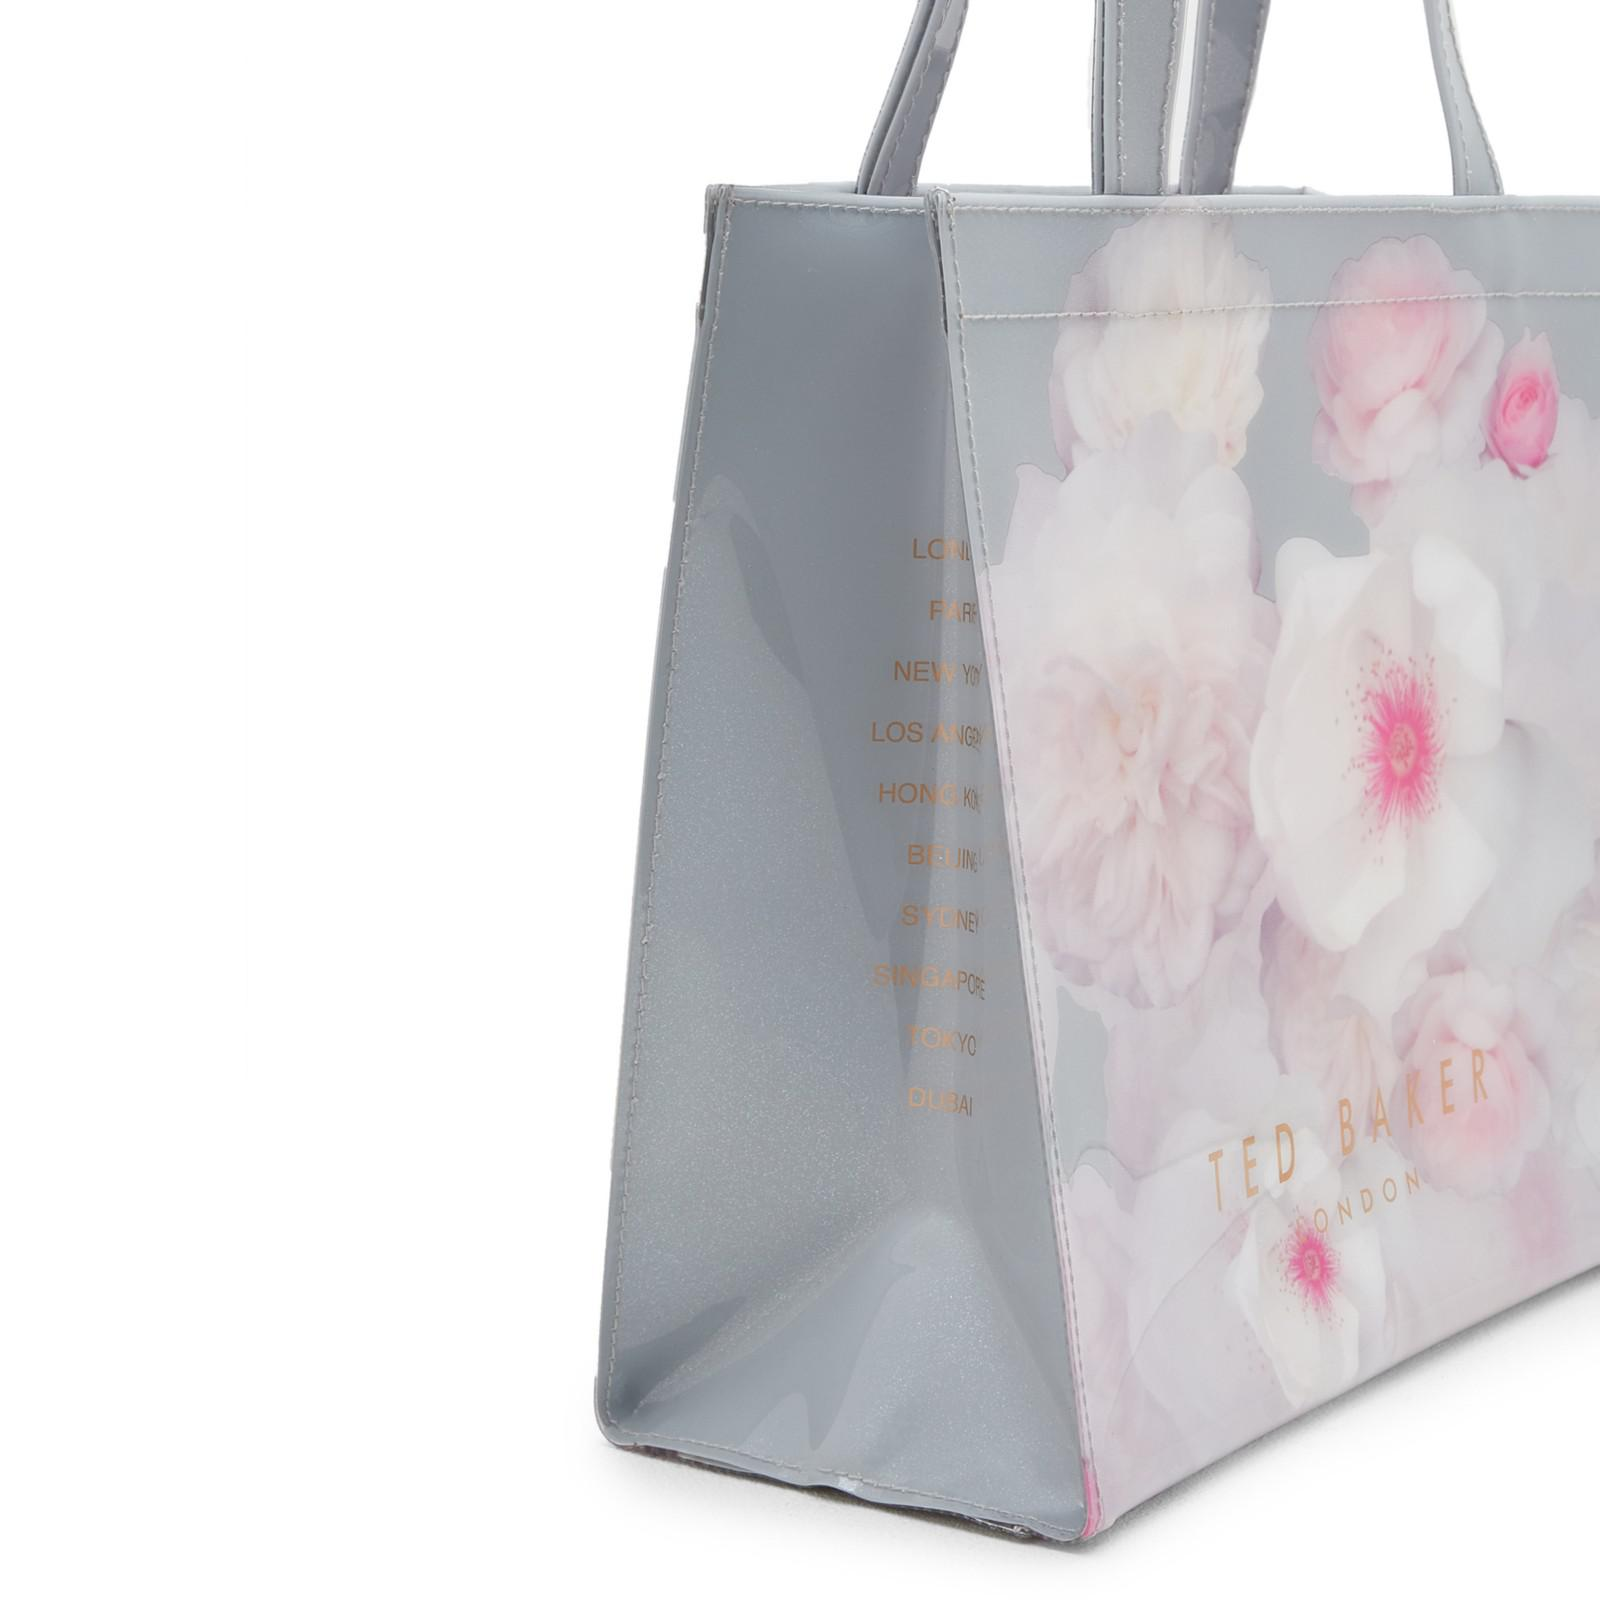 2d27874e6 Ted Baker Cerycon Chelsea Grey Shopper Bag in Gray - Lyst